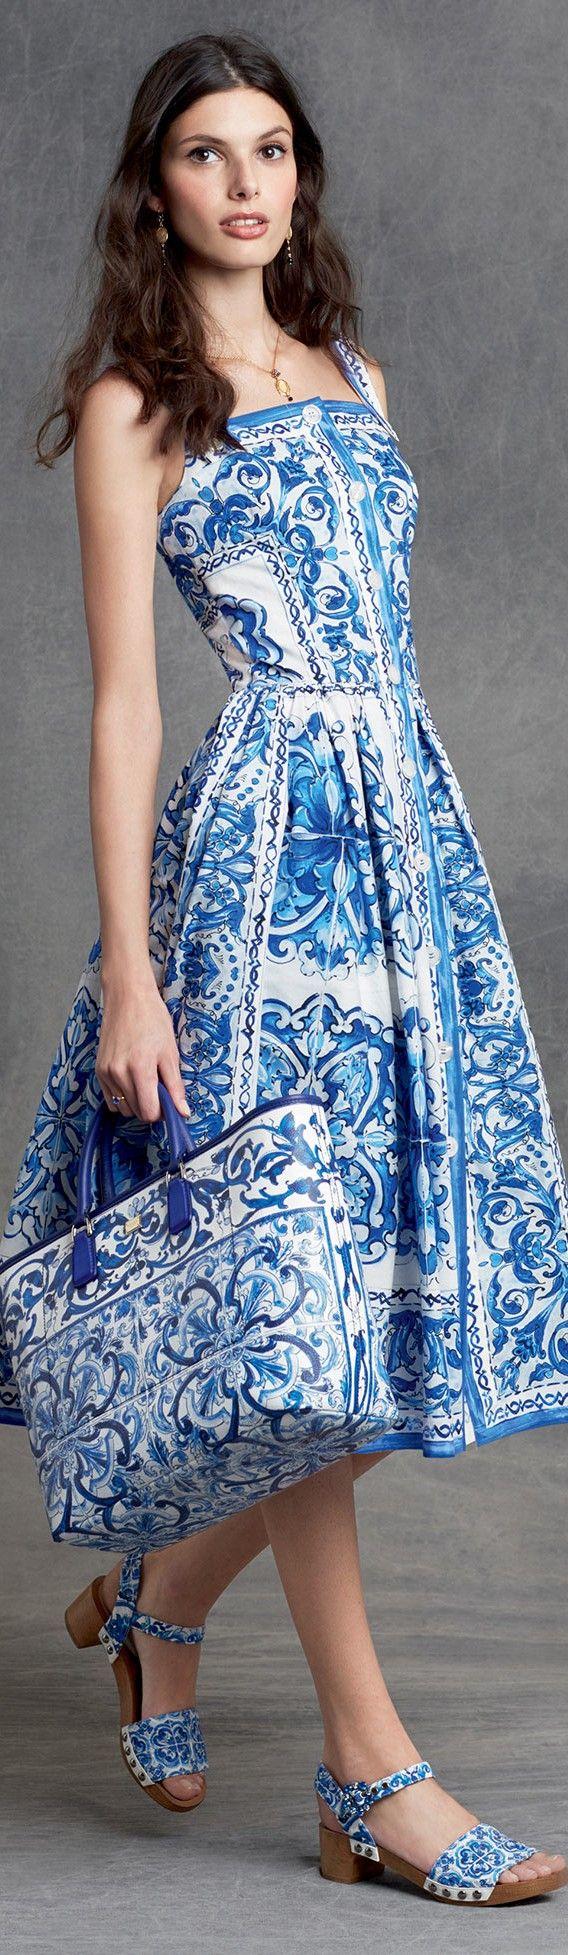 LUXURY BRANDS   Fashion trends with Dolce & Gabbana Fall 2016   www.bocadolobo.com   #dolcegabbana